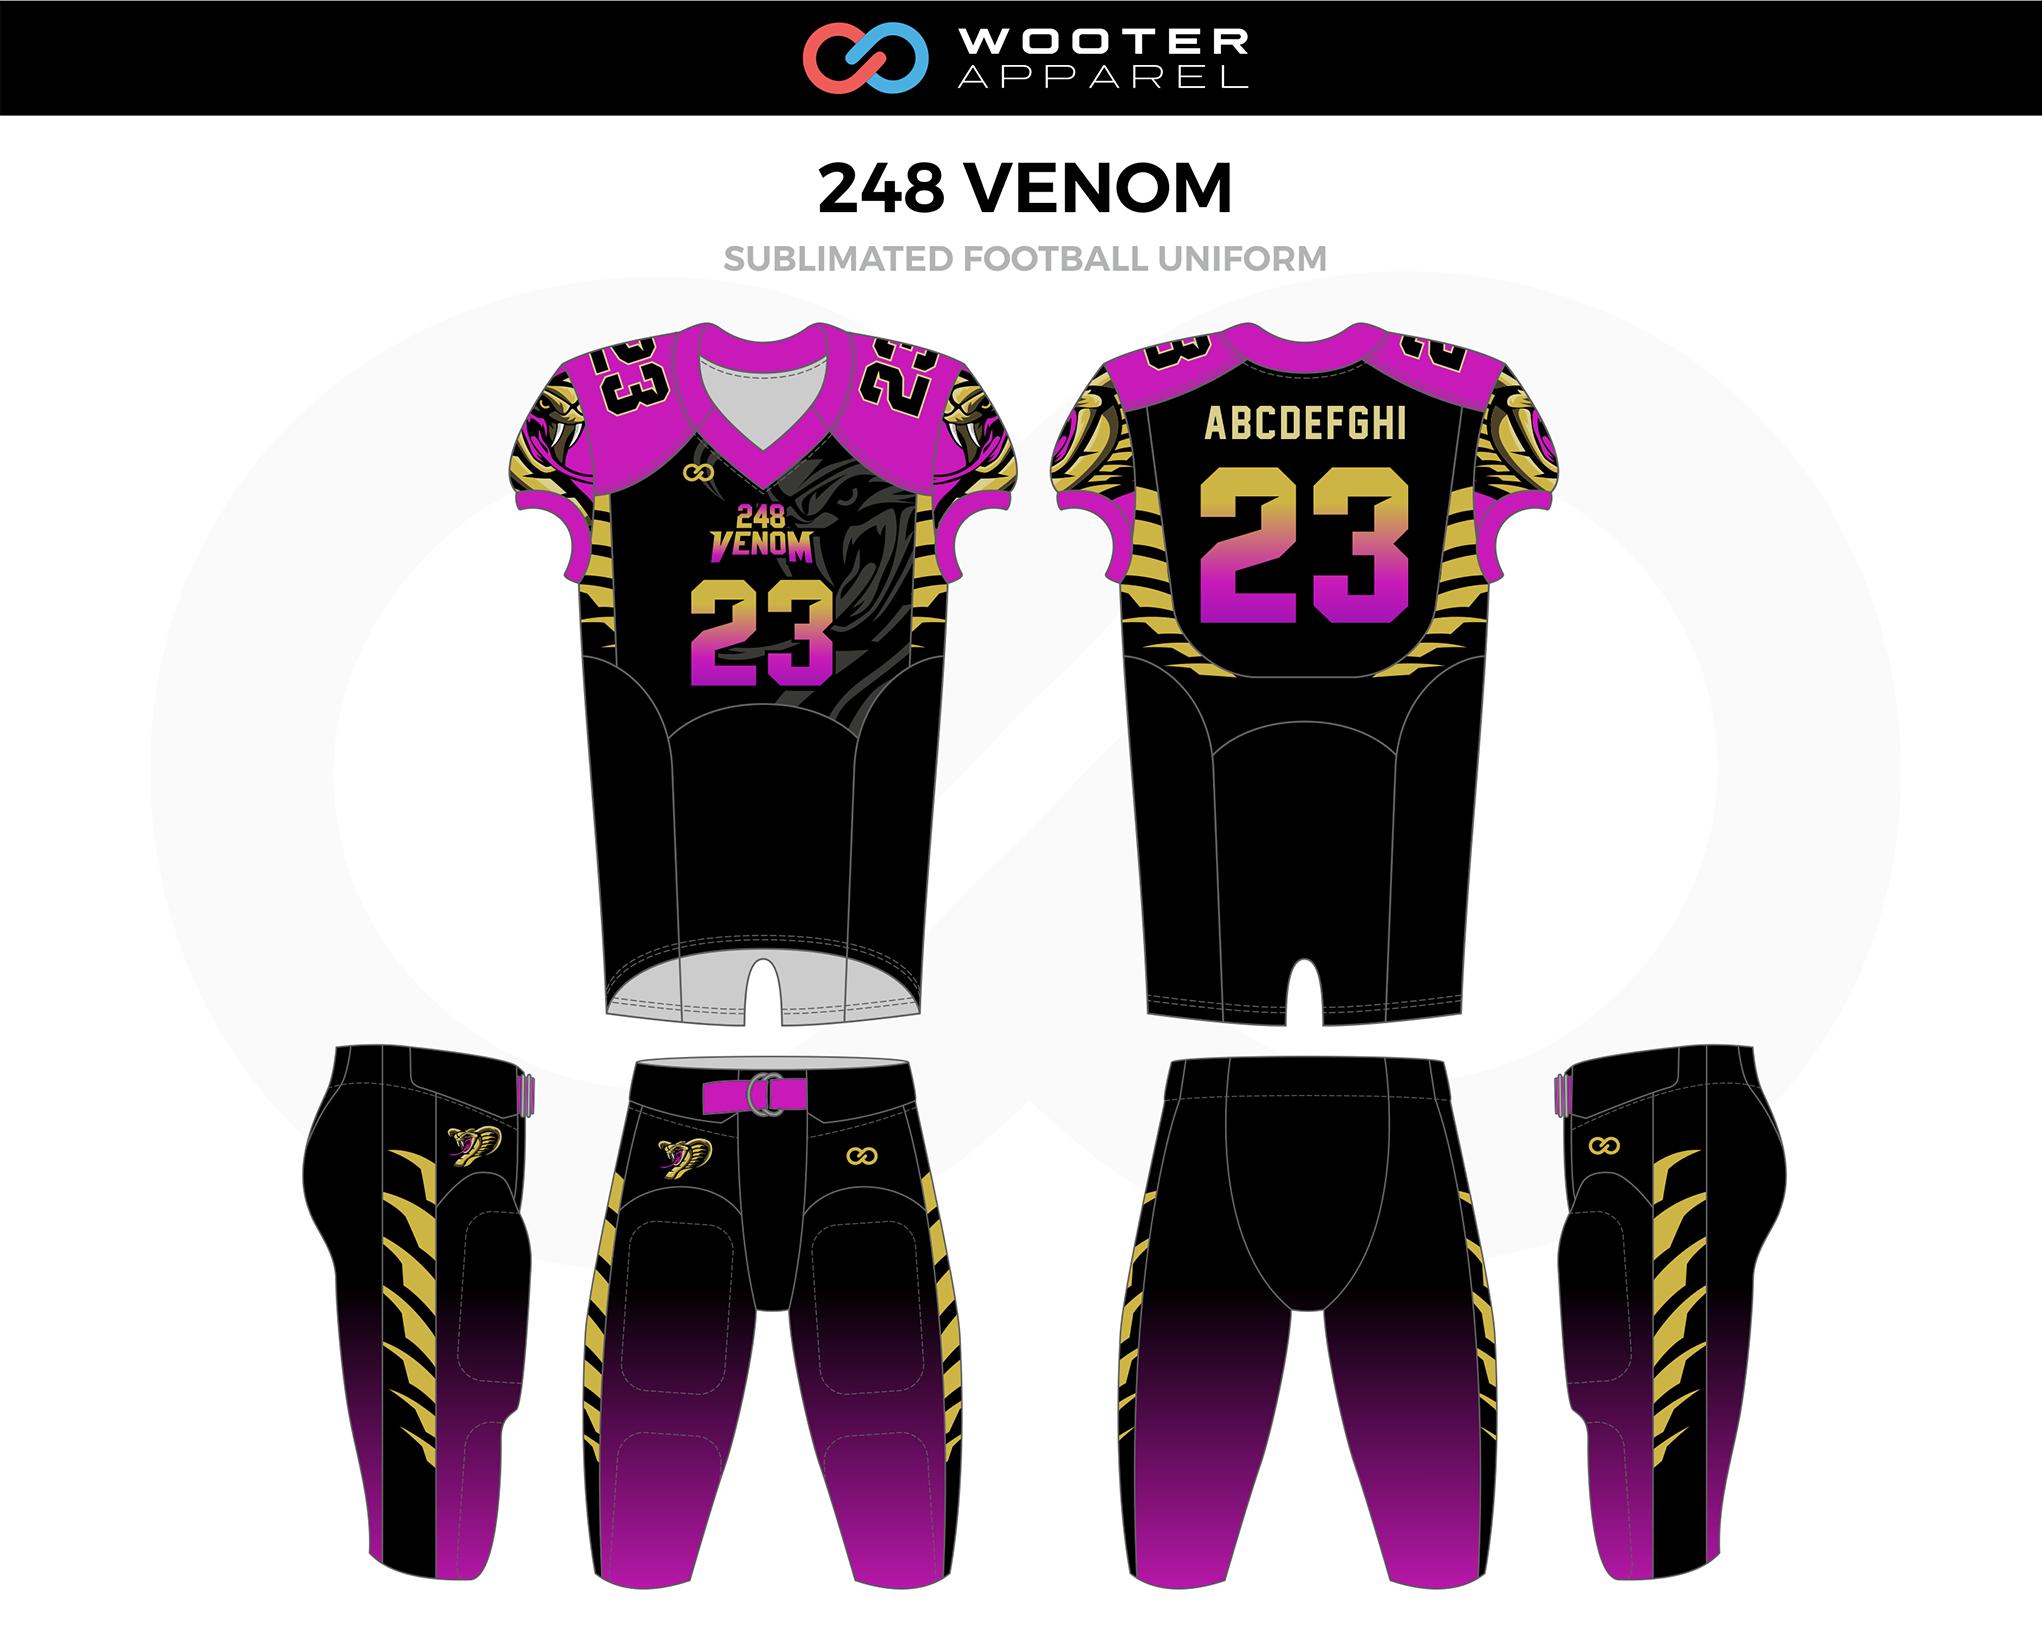 248 VENOM Gold Lavender Black Football Uniform, Jerseys, and Pants